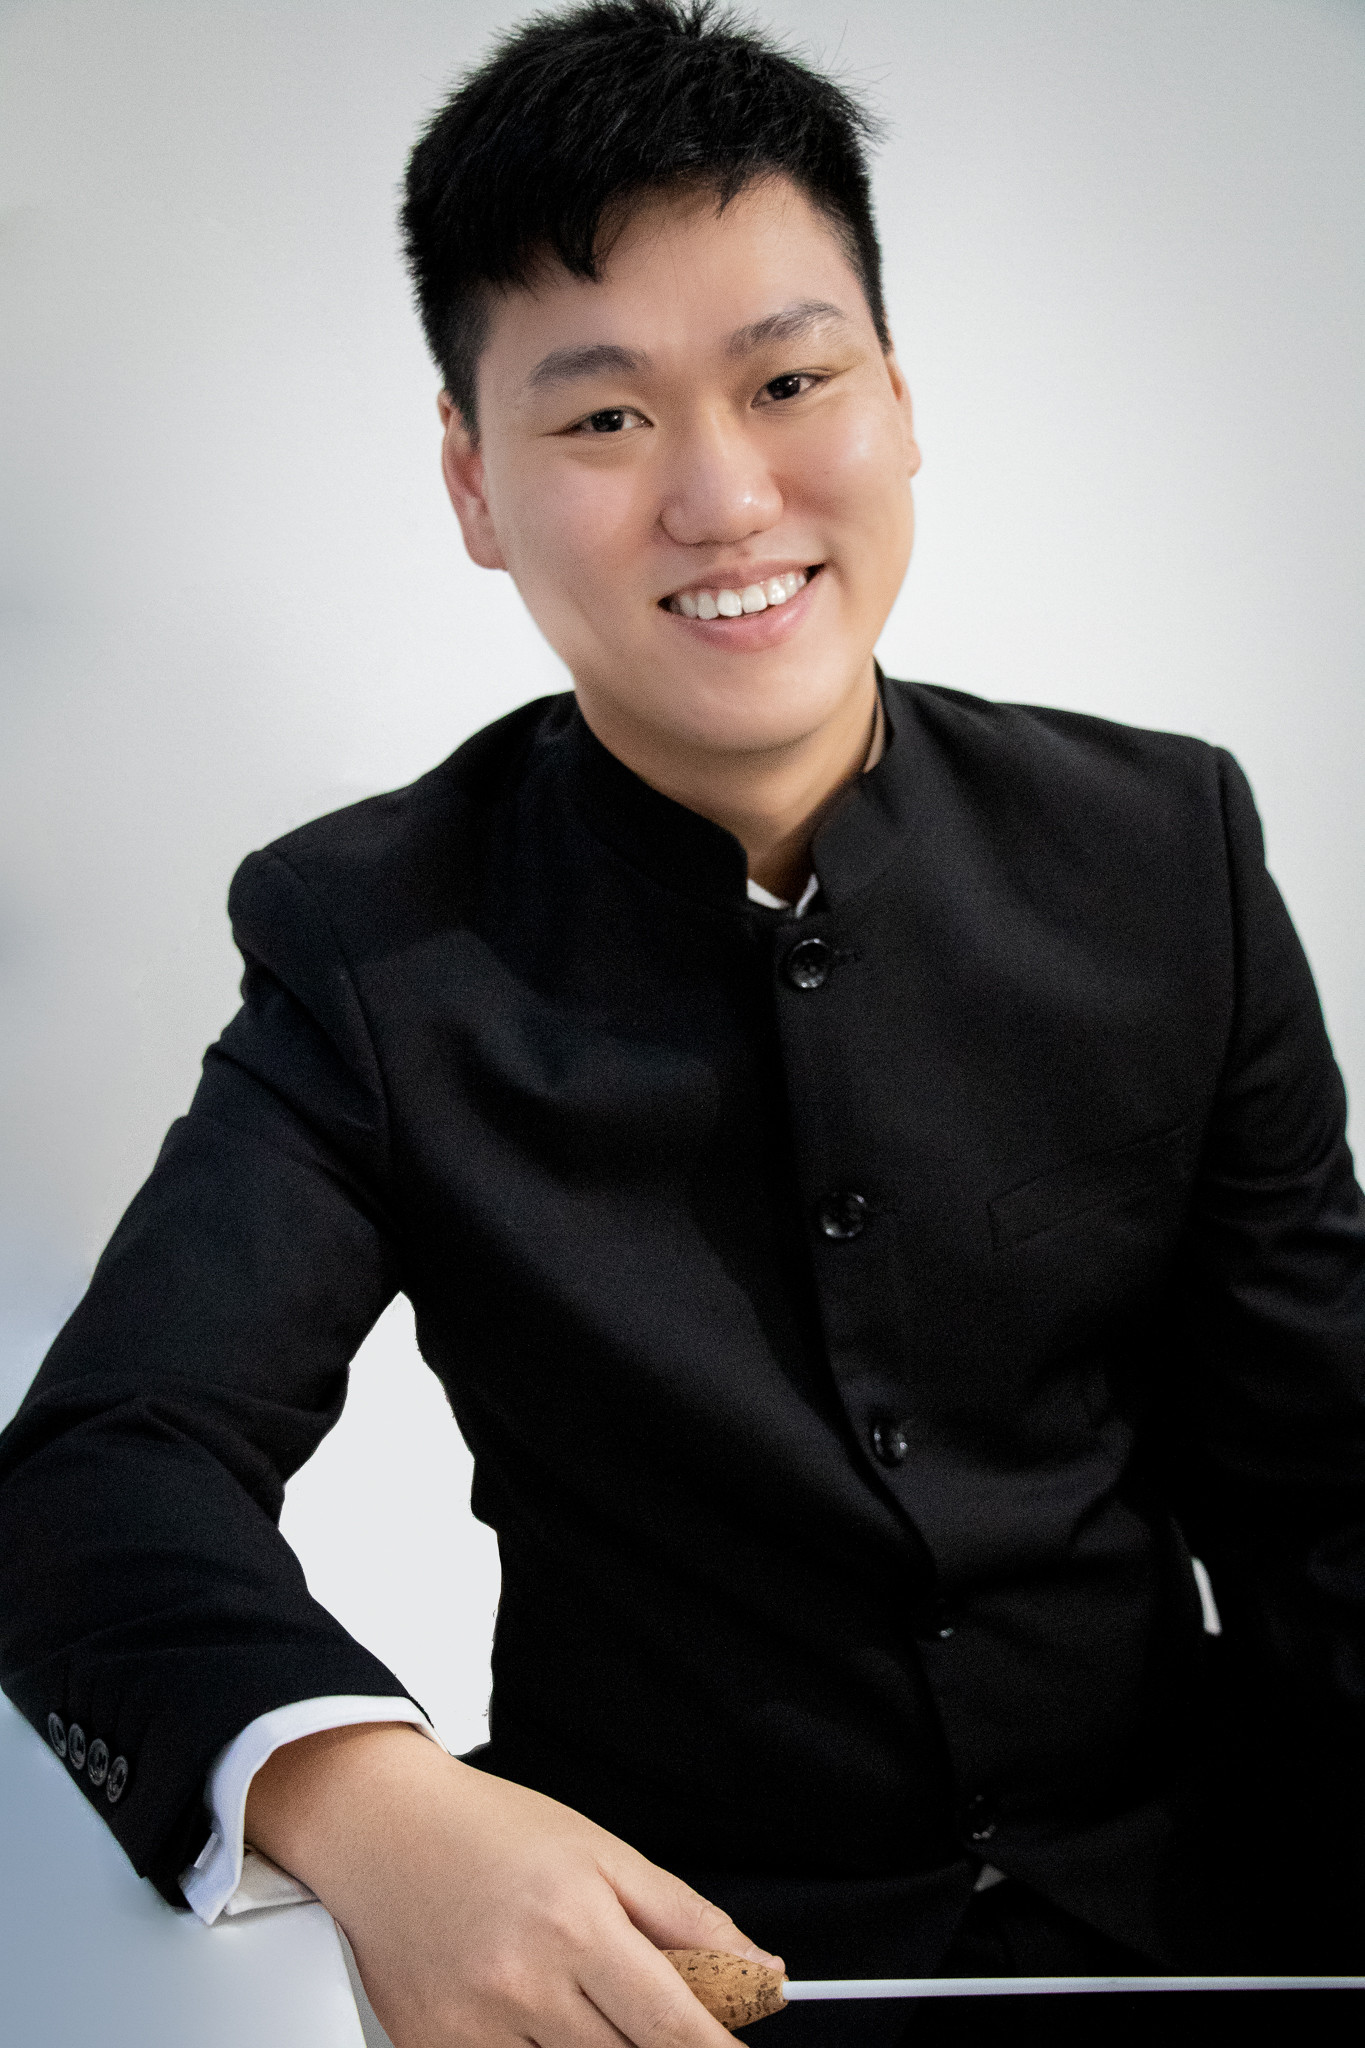 Headshot of conductor Melvin Tay